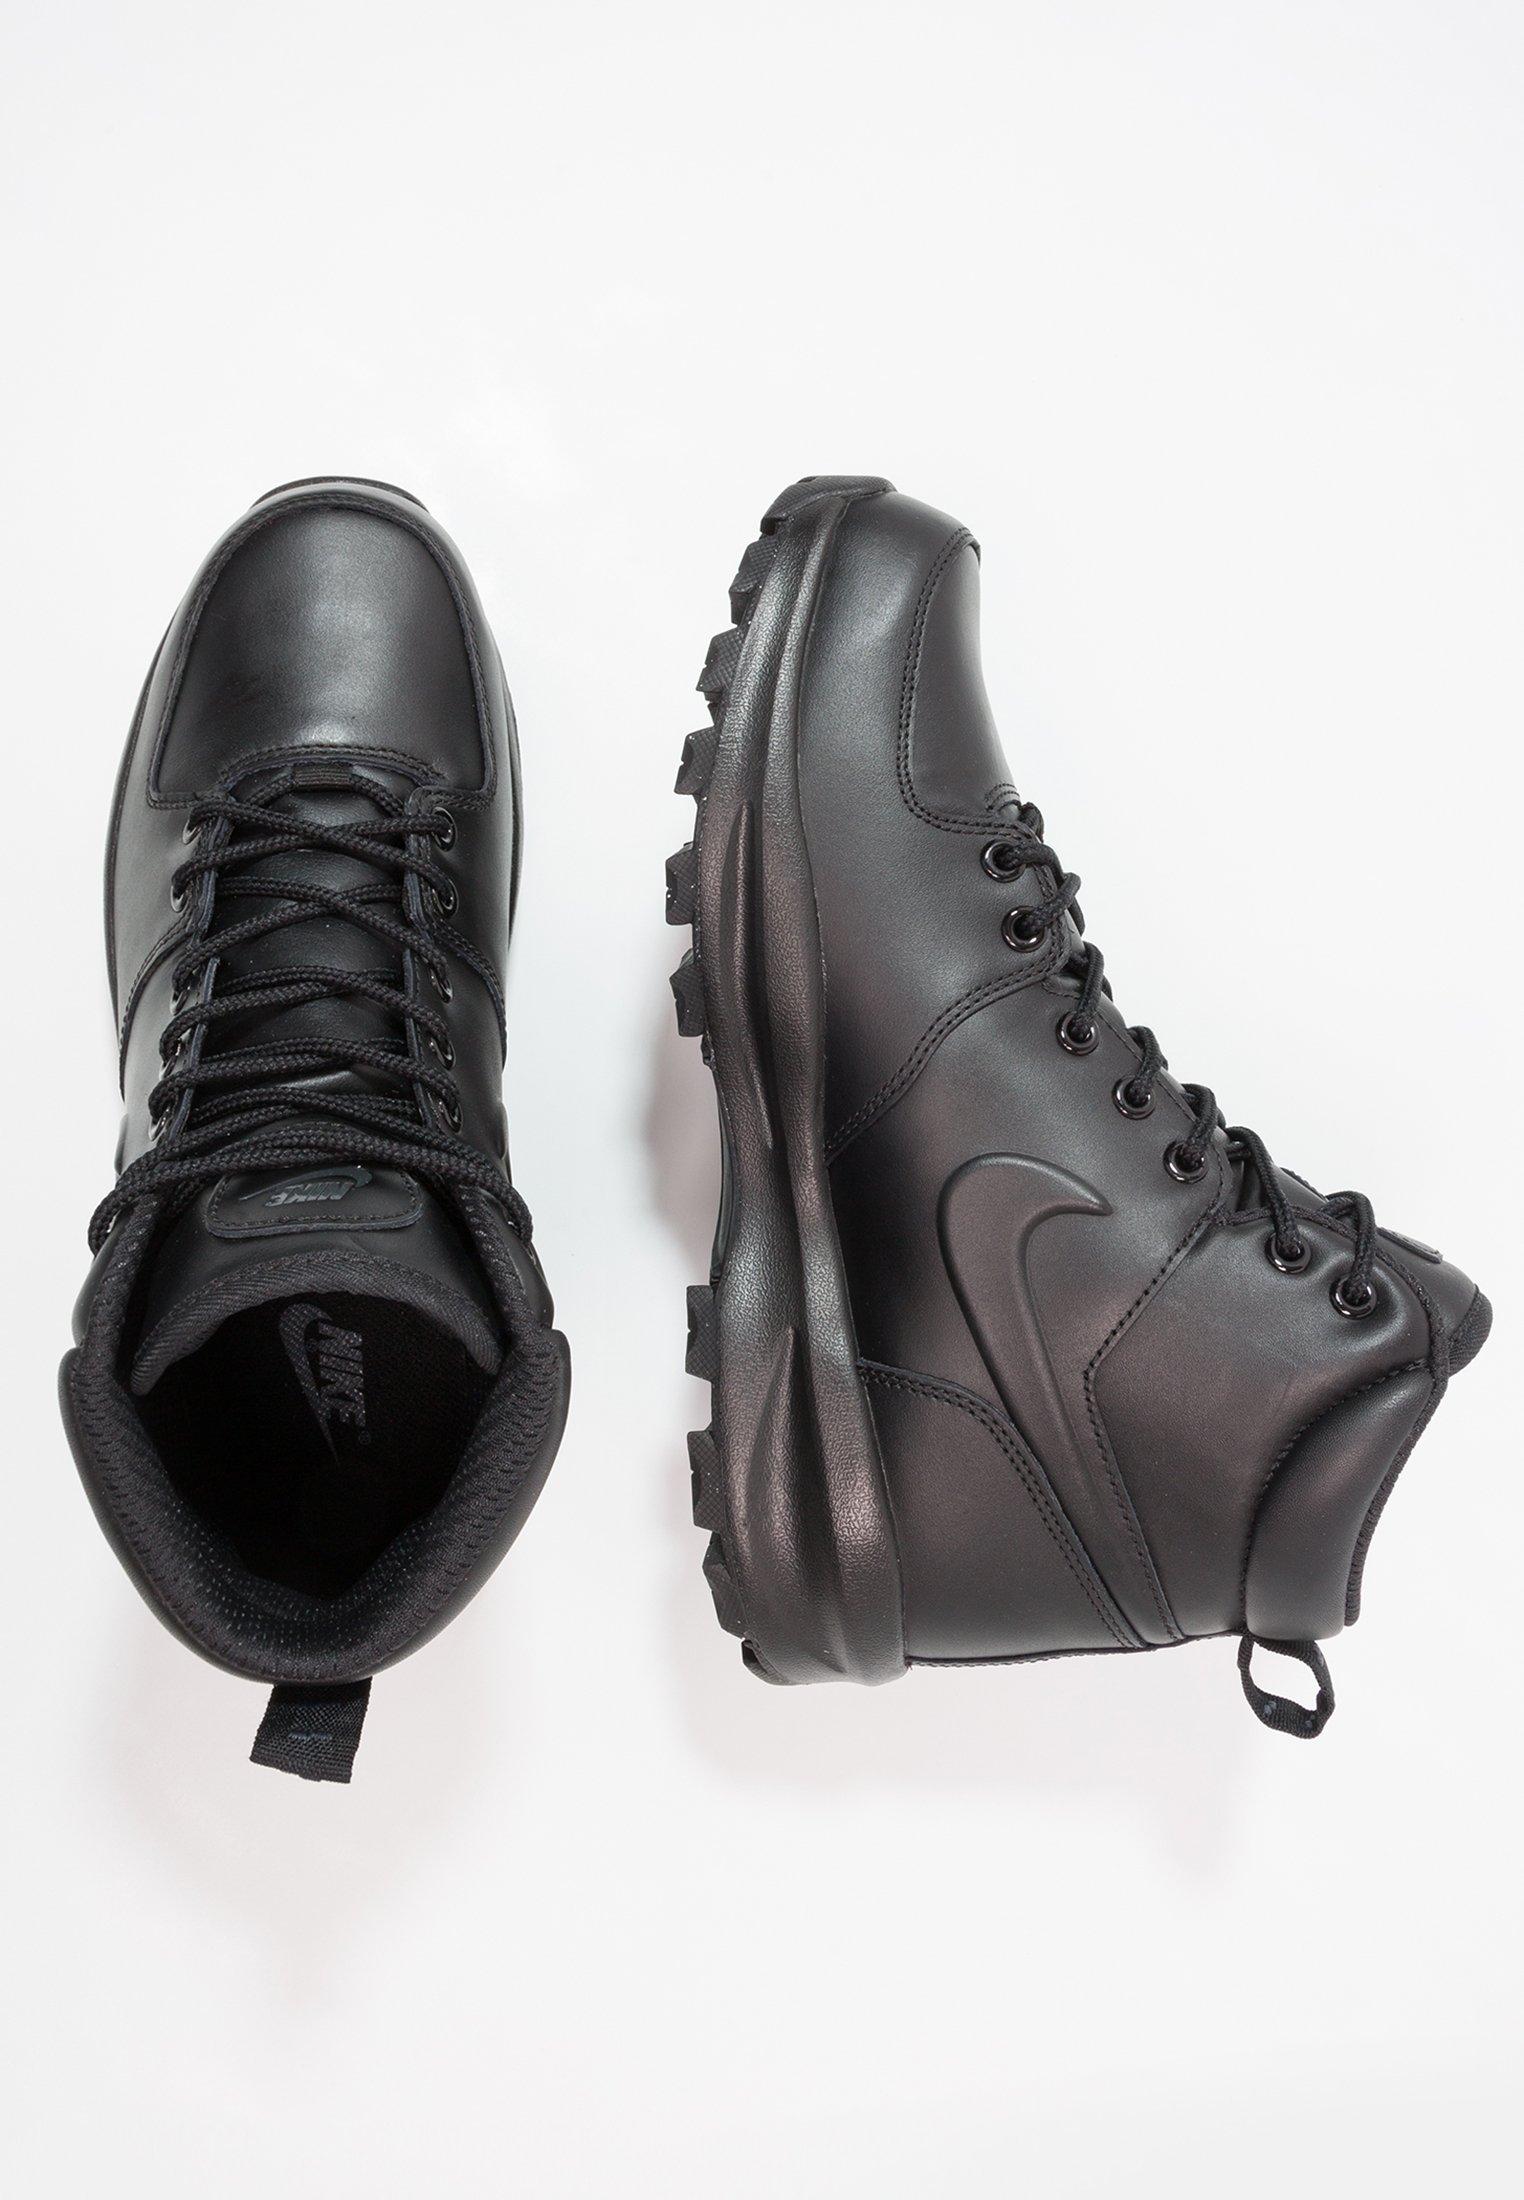 chaussures de securite homme marque nike montante